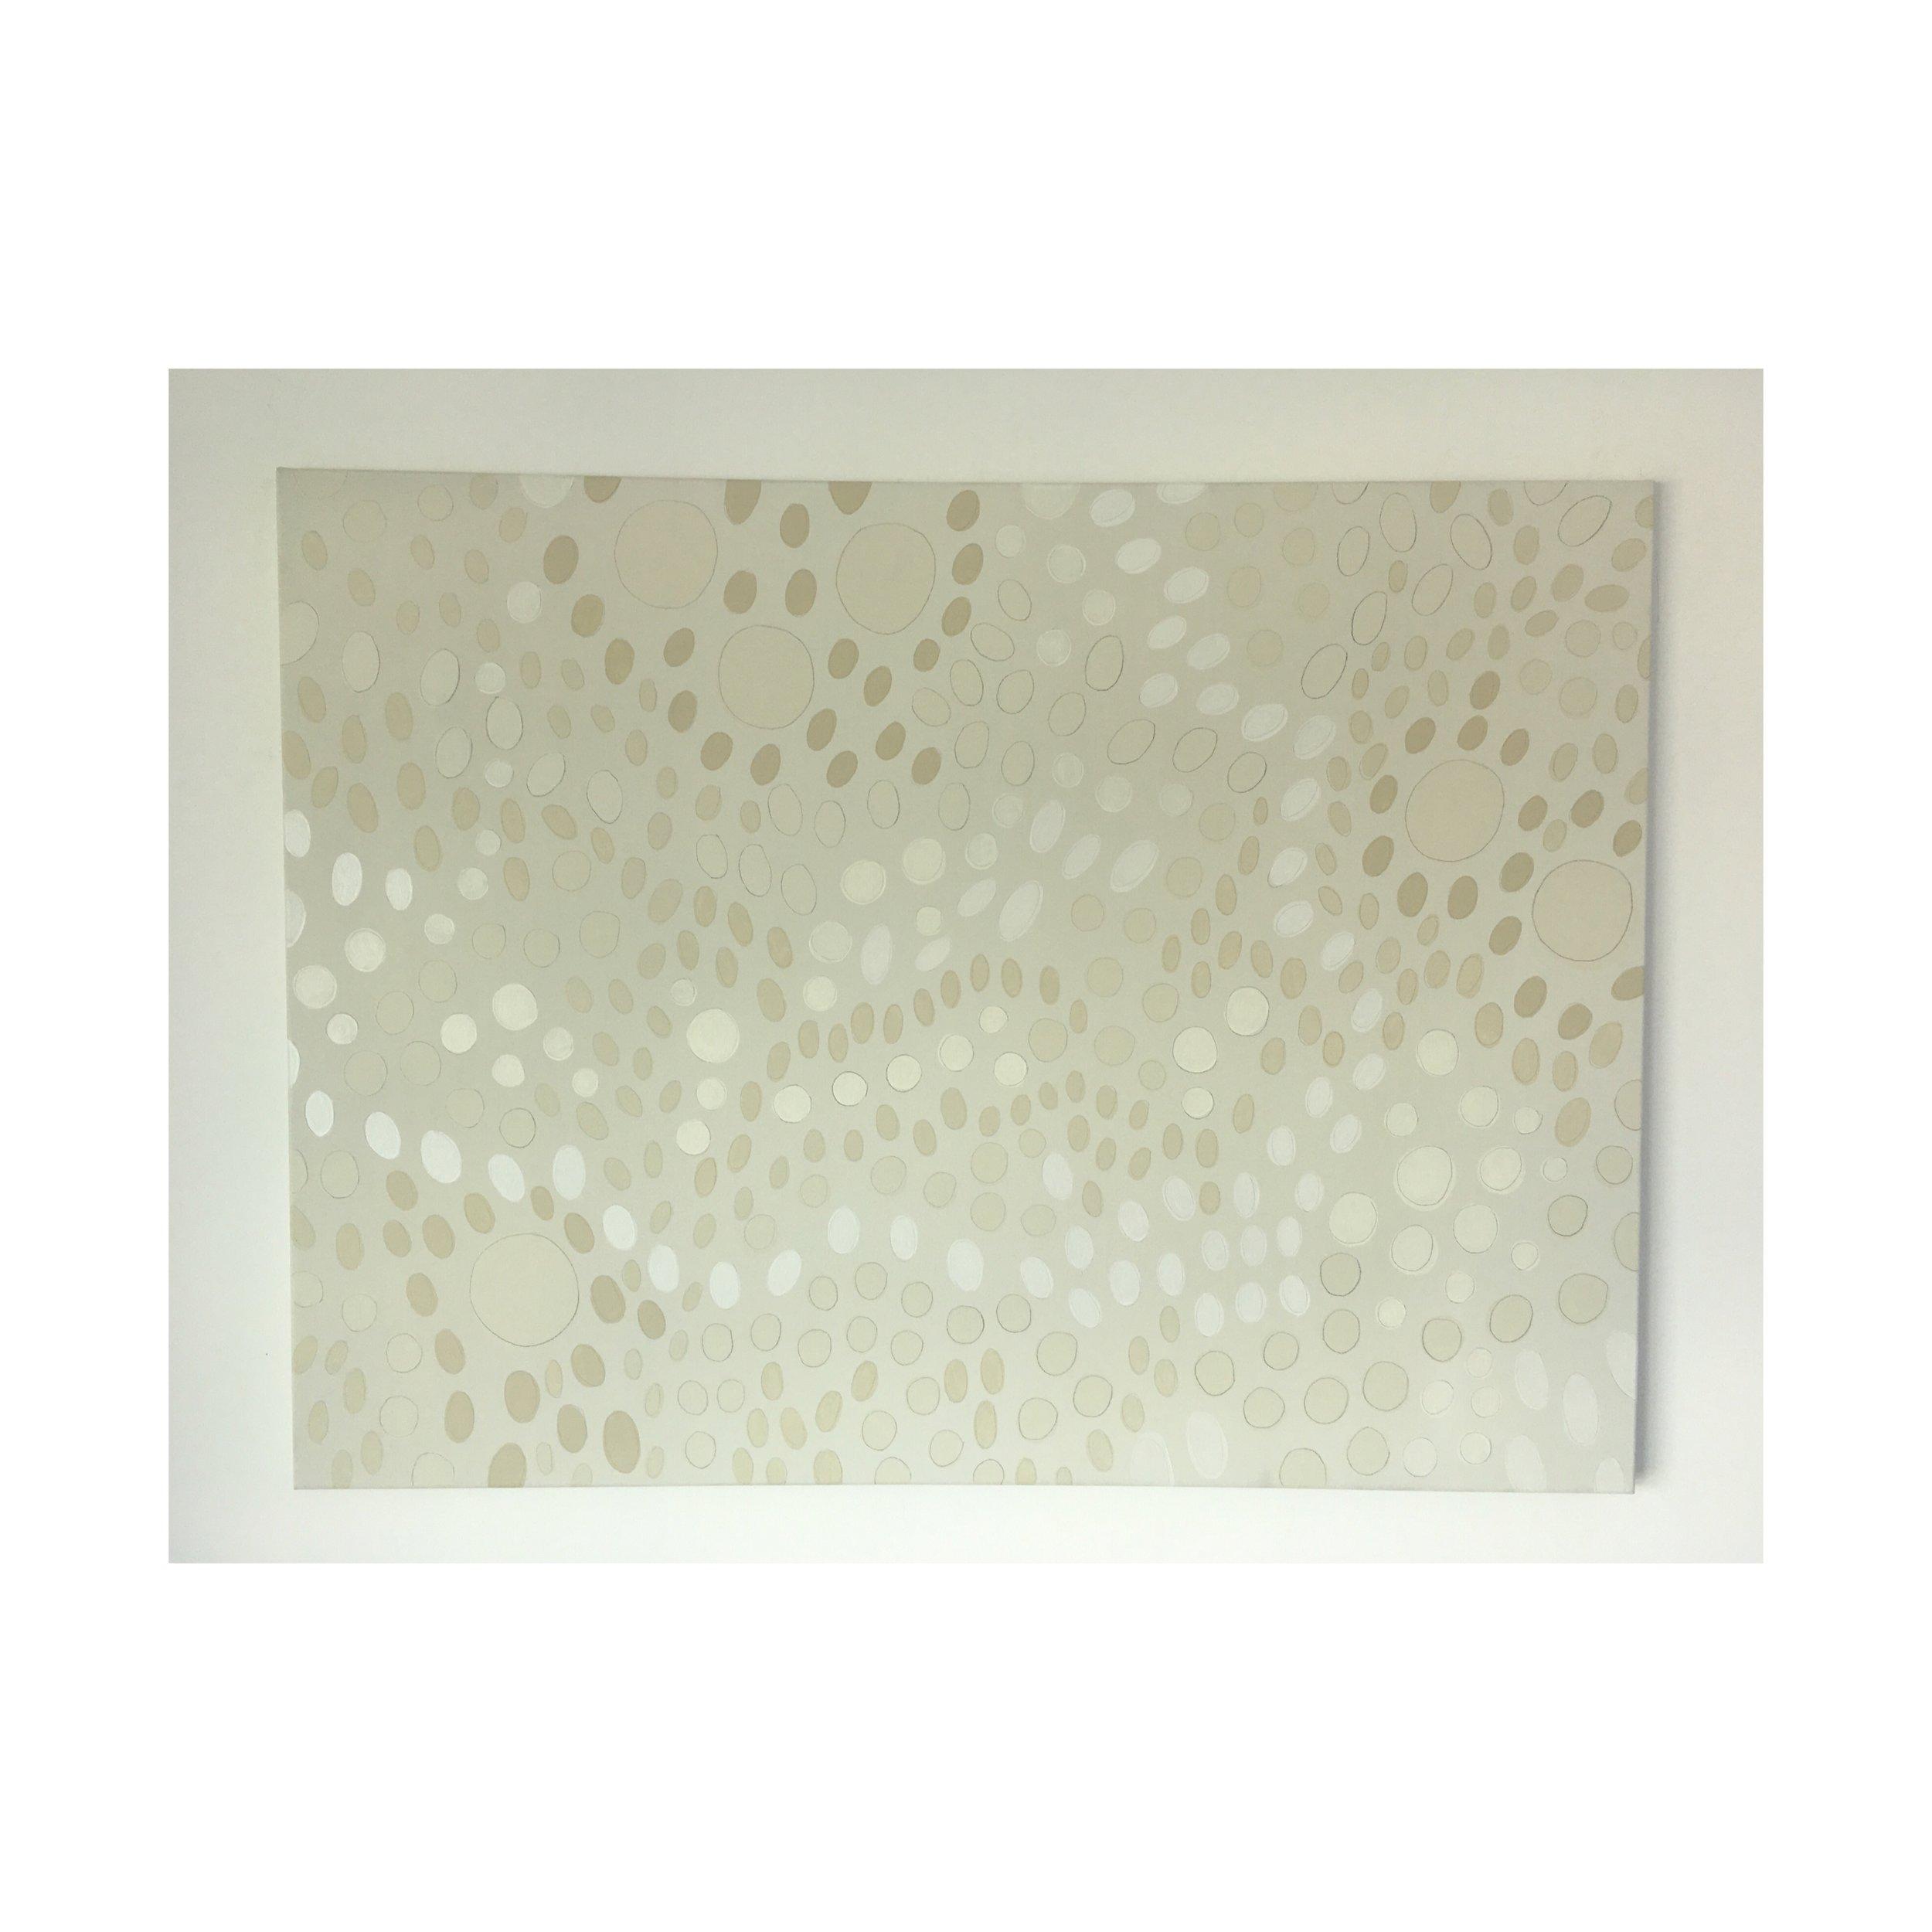 Invisible, 6:8, Pigmented Acrylic, Tempera, Graphite on Canvas, 121 x 91 cm, 2018.JPG